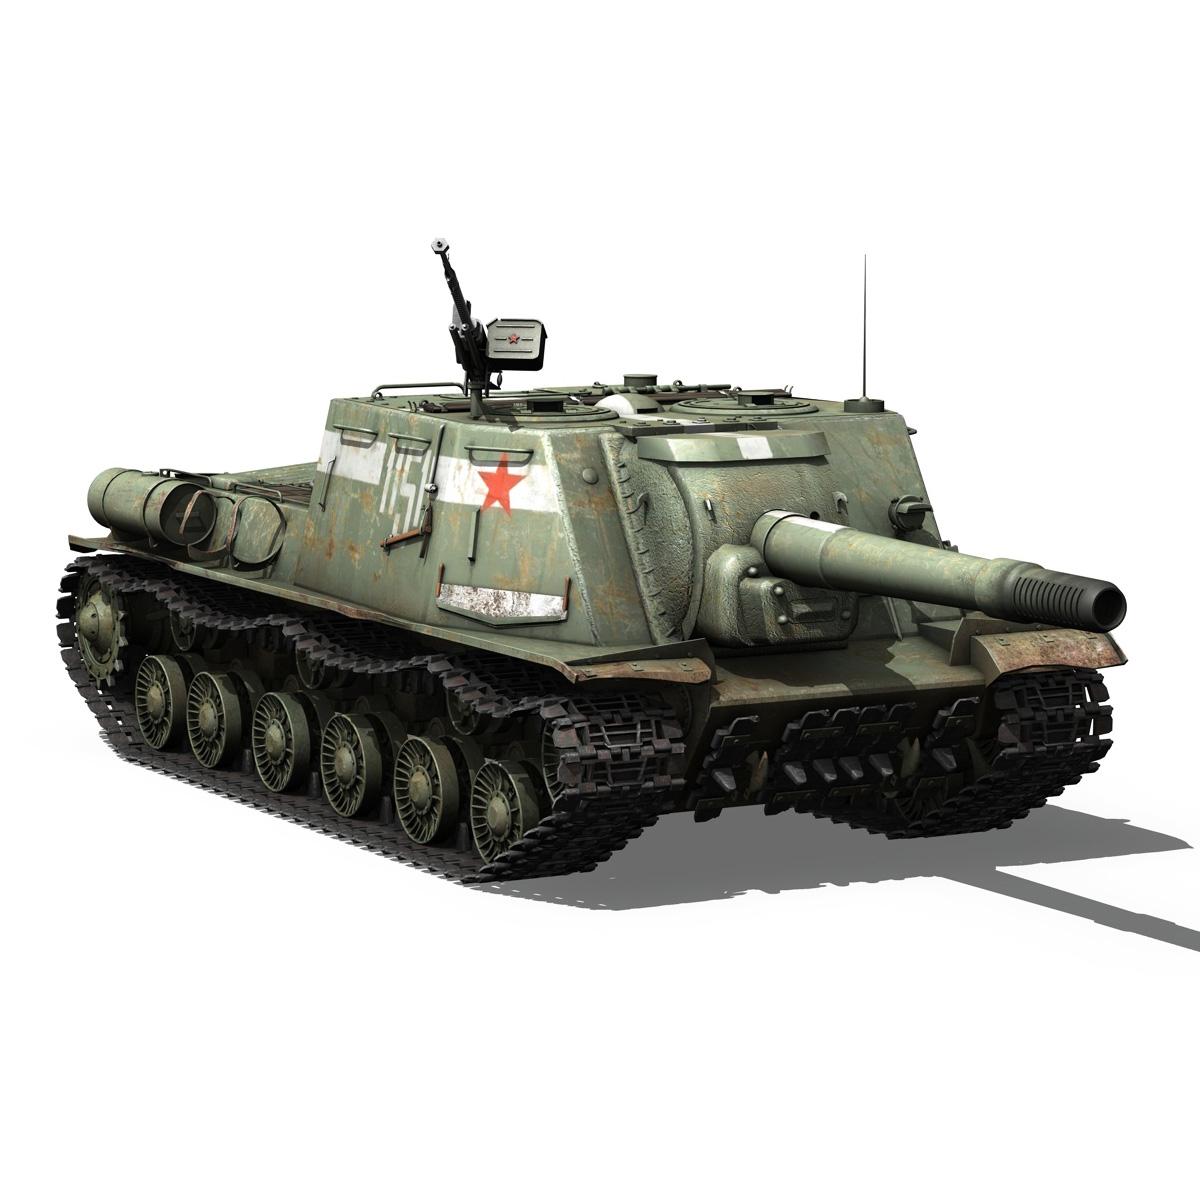 isu 152 soviet heavy self propelled gun 3d model 3ds fbx c4d lwo obj 187532